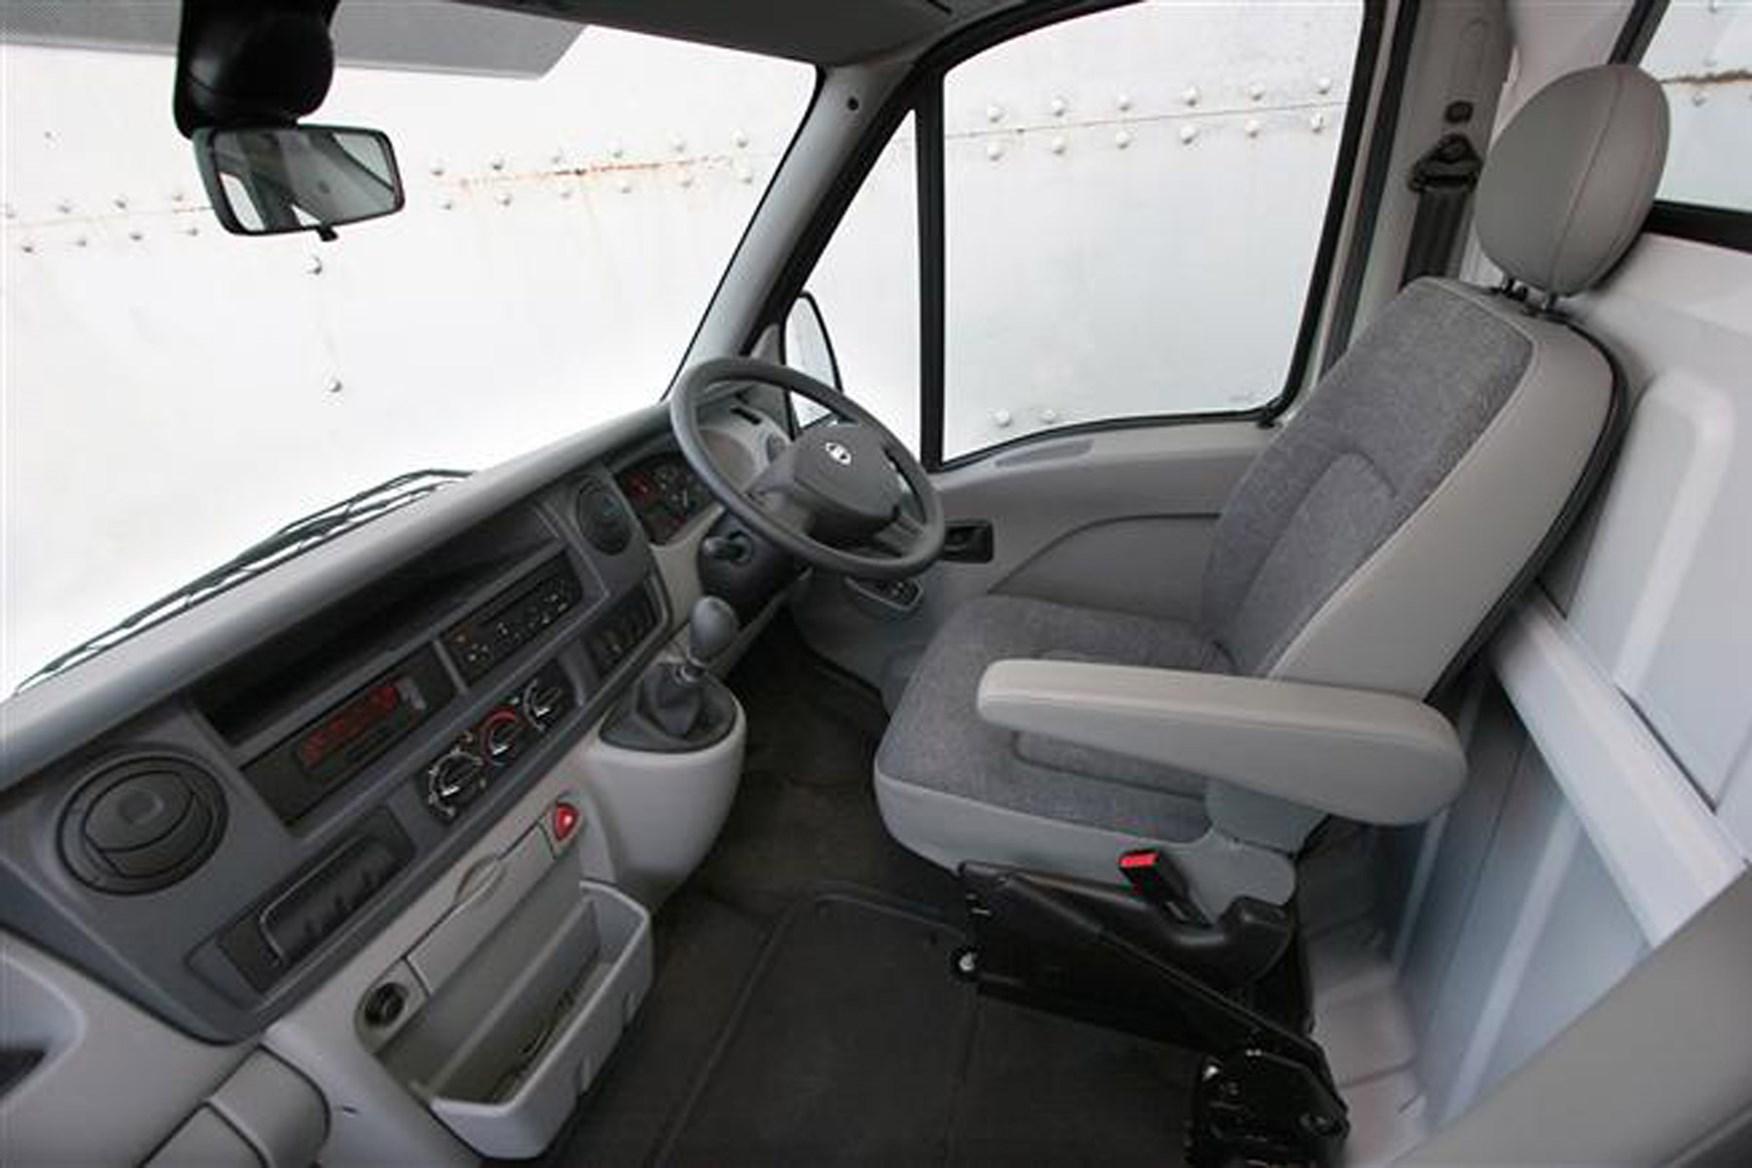 Nissan Interstar 2003-2011 review on Parkers Vans - interior, cabin